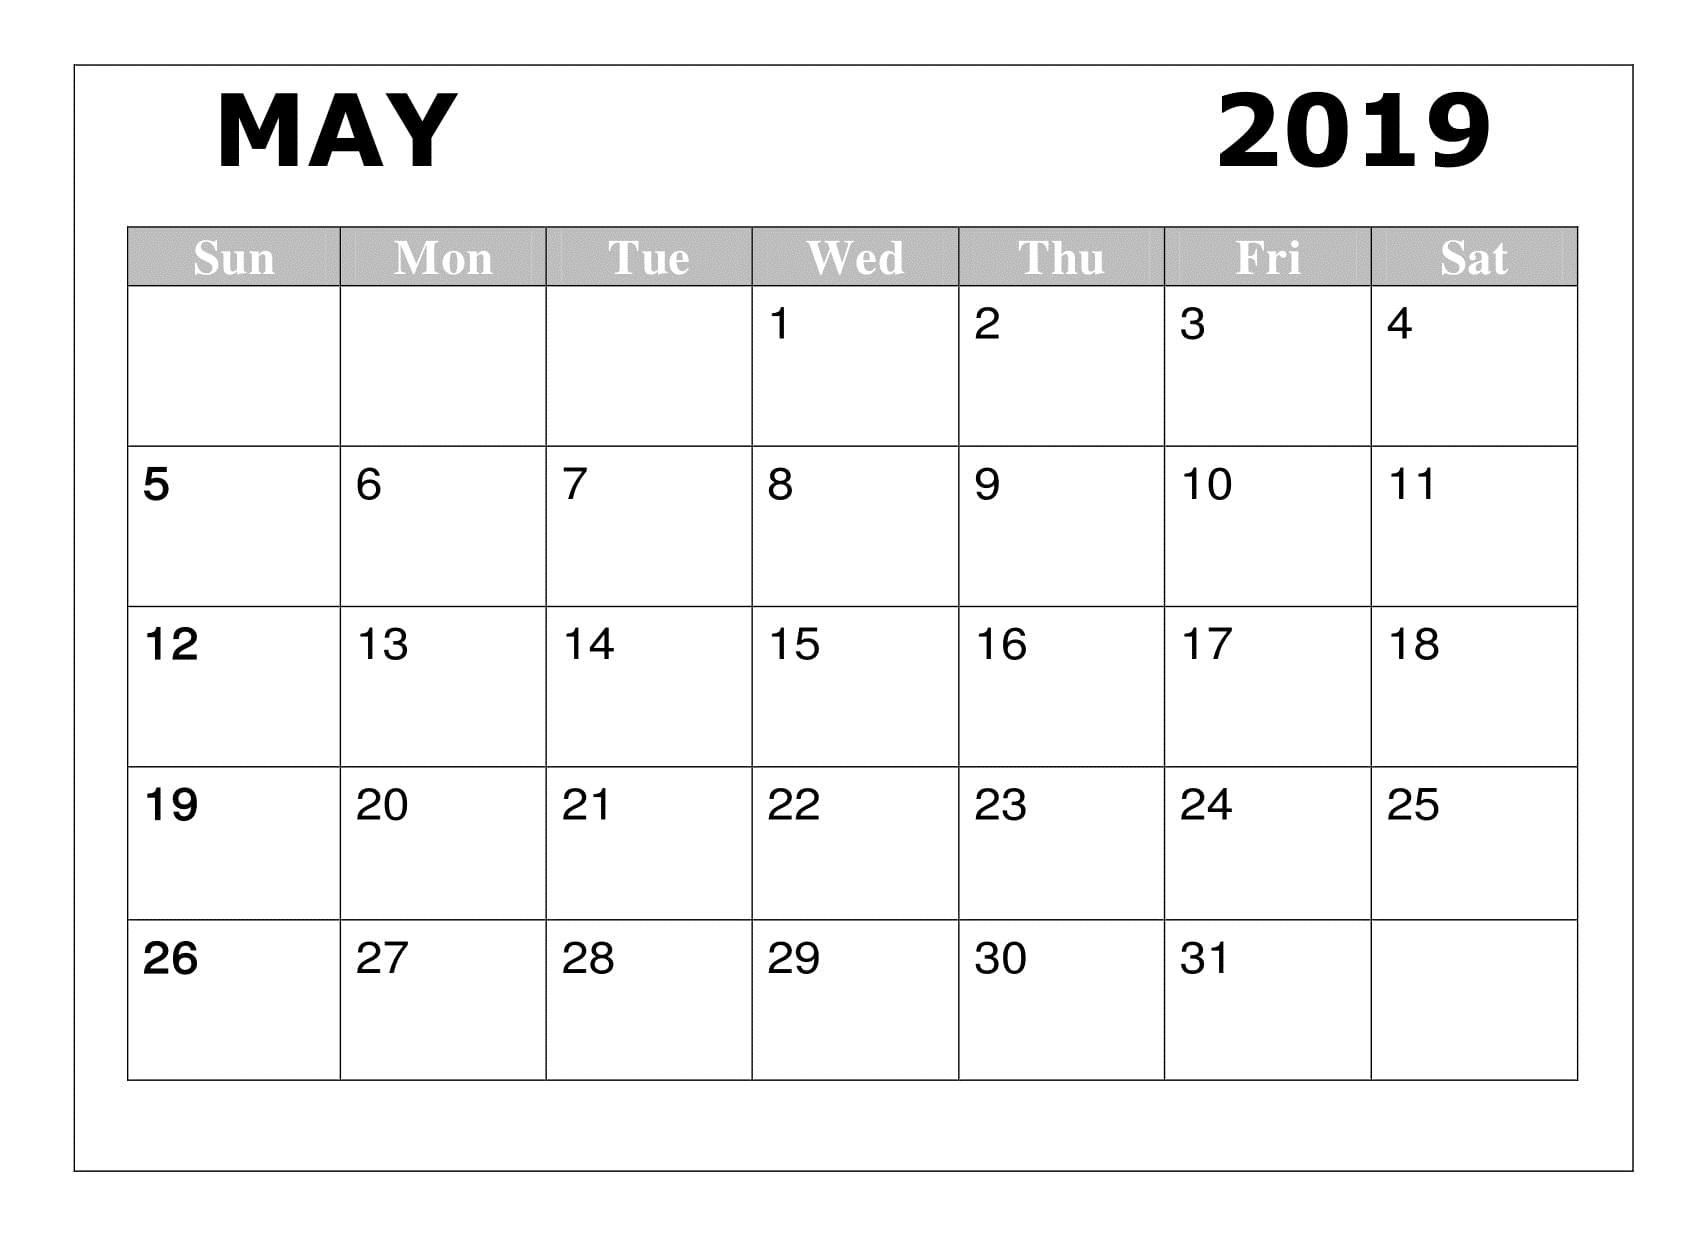 May 2019 Calendar Printable Template